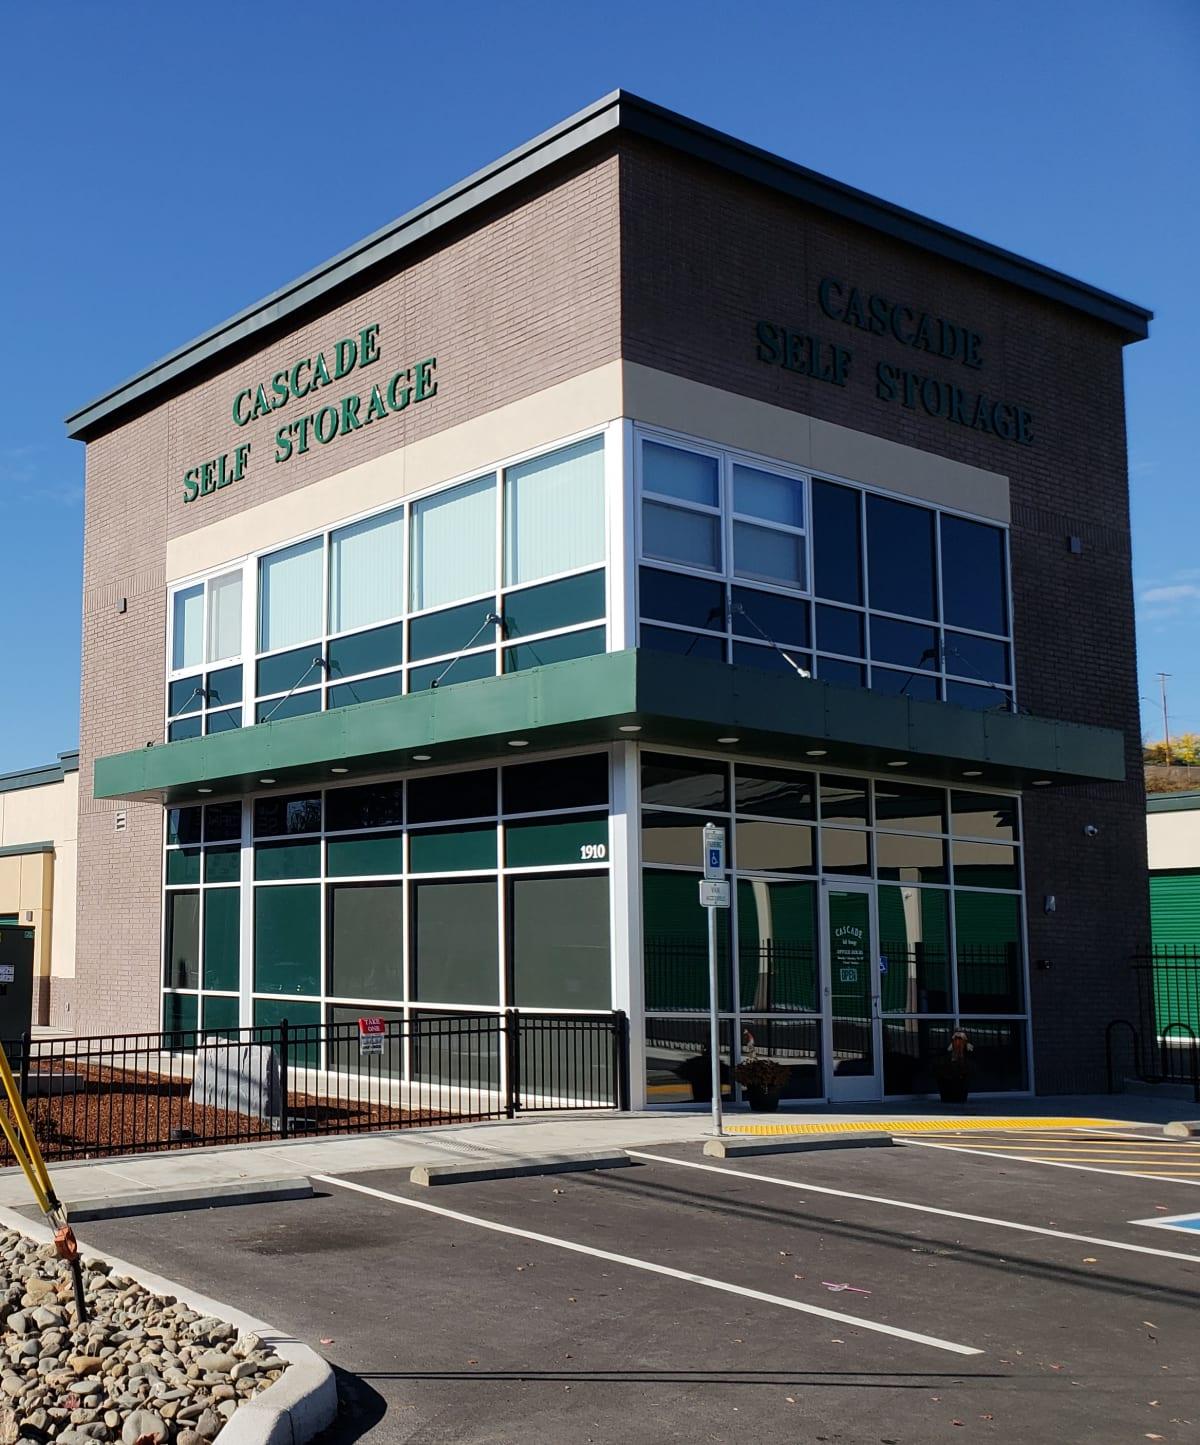 Cascade Self Storage in Roseburg, Oregon, Privacy Policy